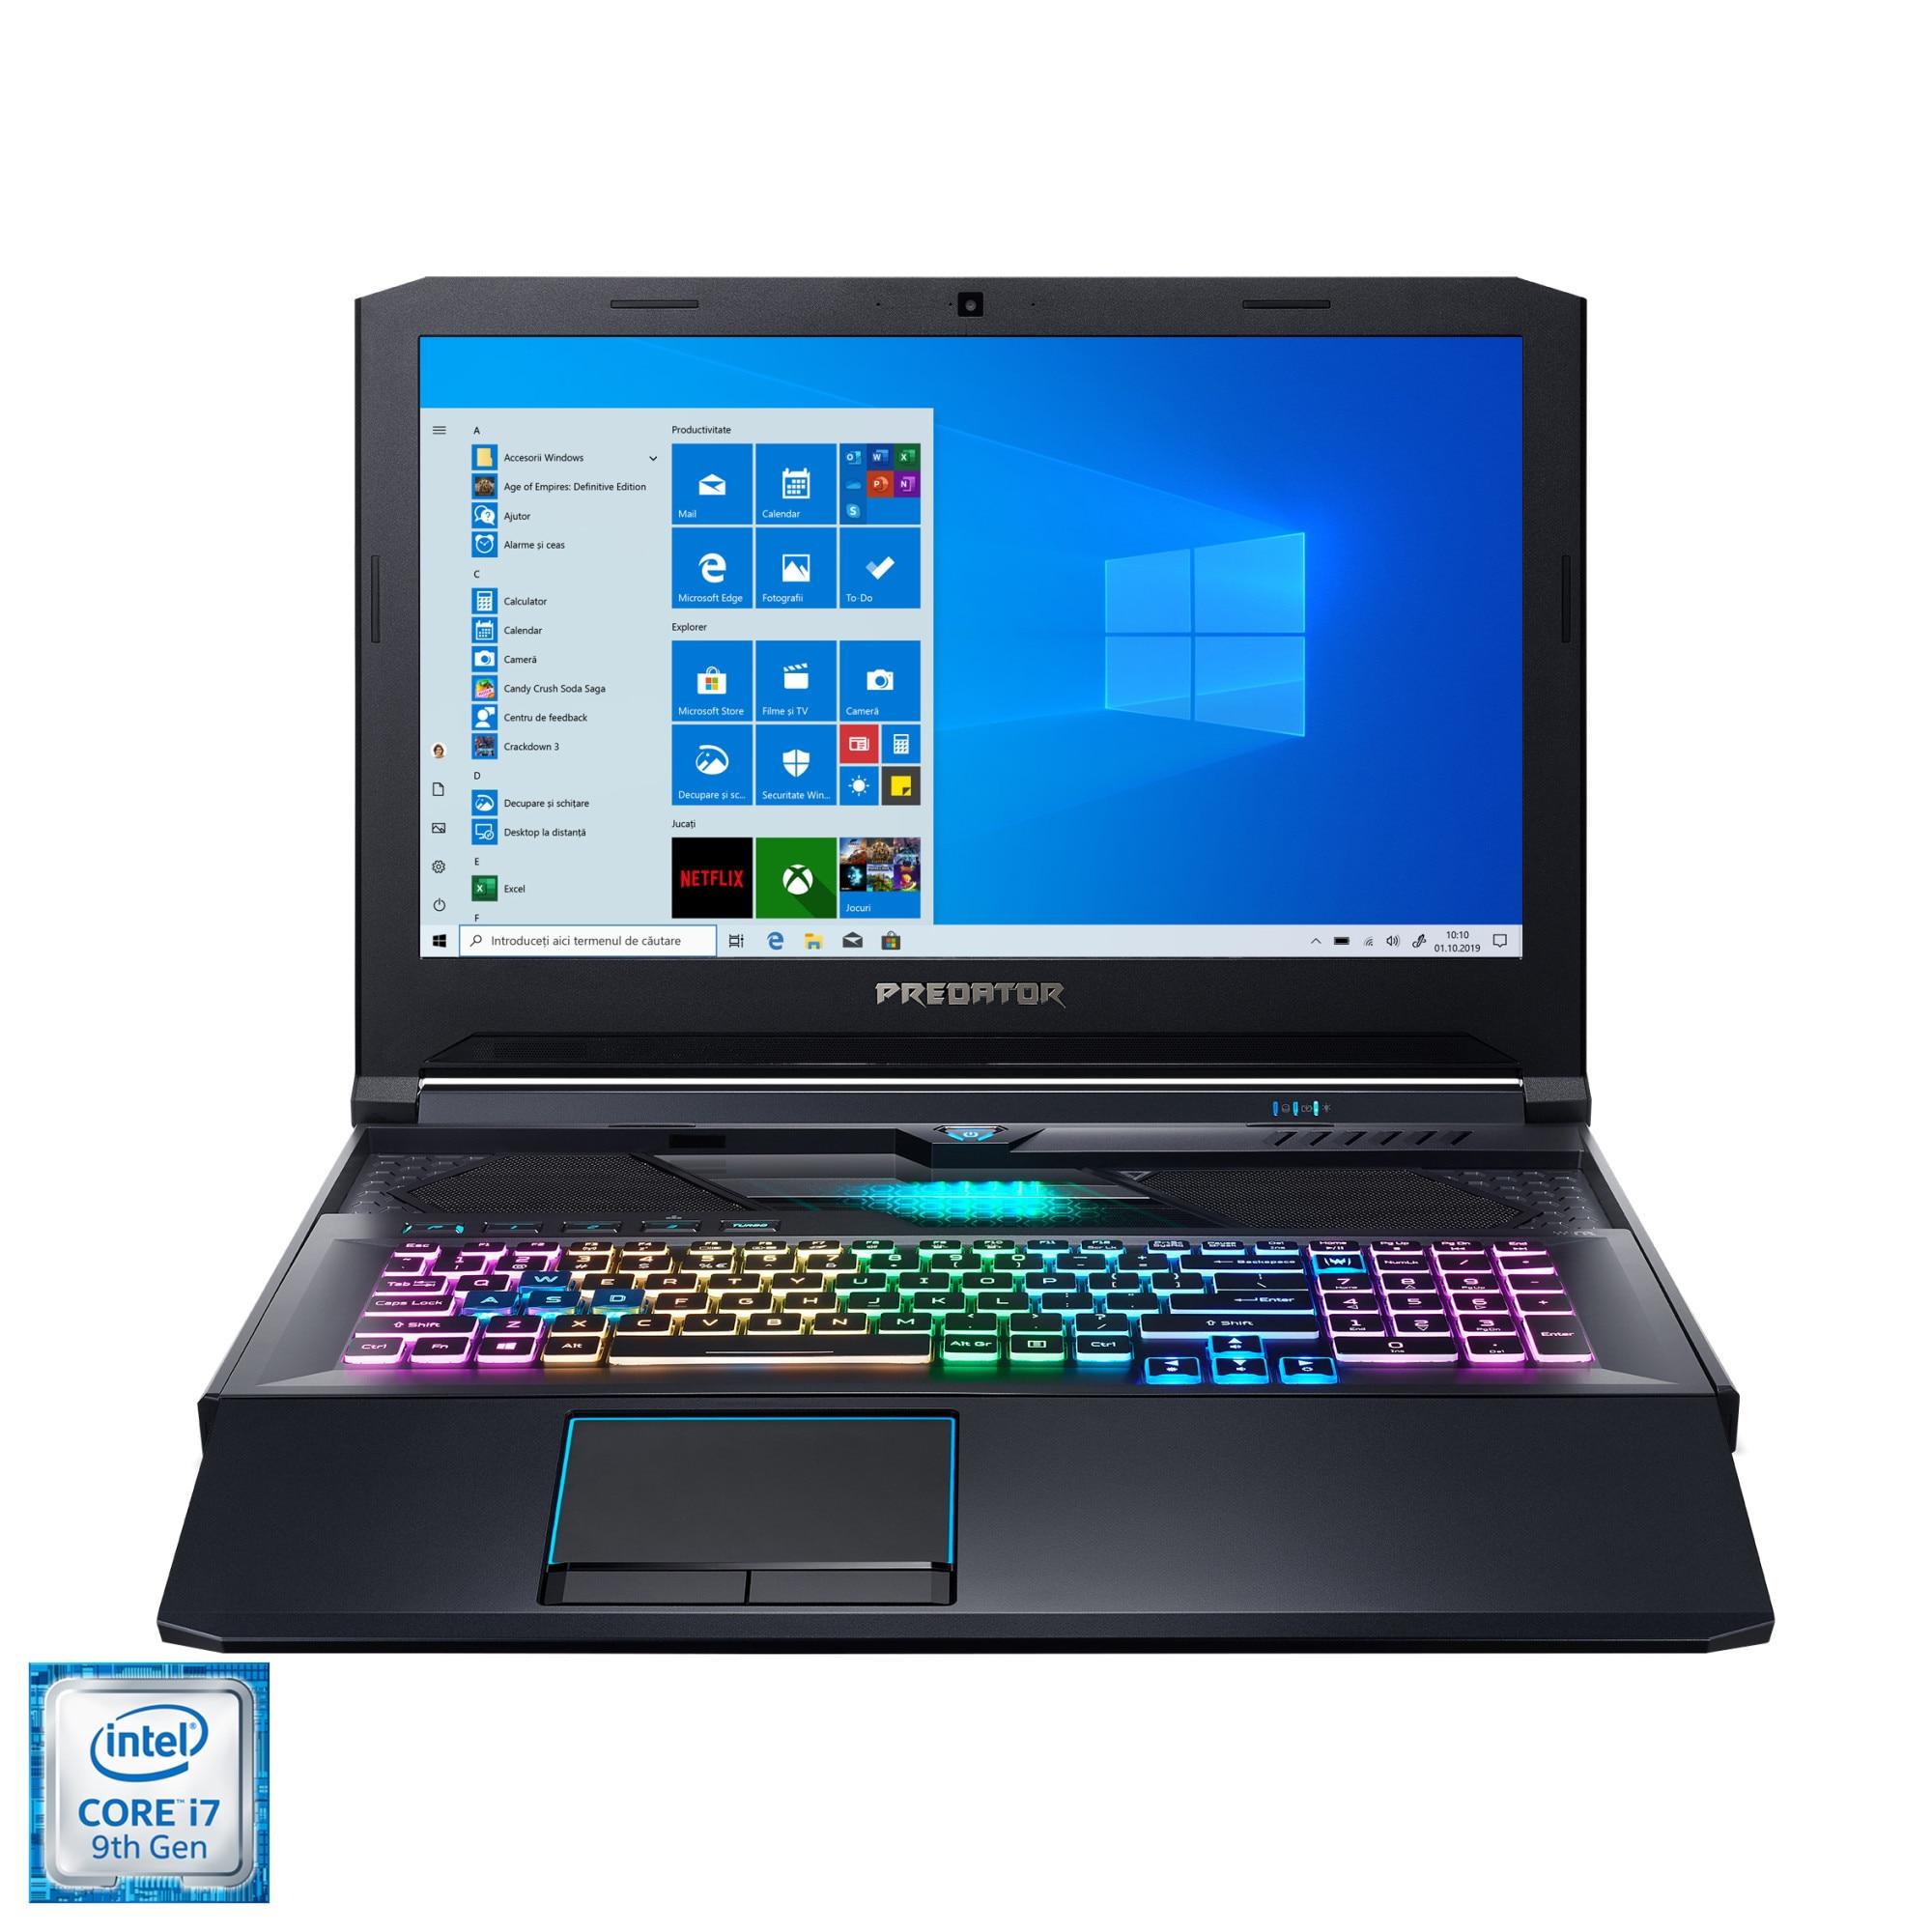 "Fotografie Laptop Gaming Acer Predator Helios 700 PH717-71 cu procesor Intel® Core™ i7-9750H pana la 4.5 GHz, 17.3"", Full HD, IPS, 144Hz, 16GB, 1TB SSD, GeForce RTX 2080 8GB, Windows 10 Home, Abyssal Black"